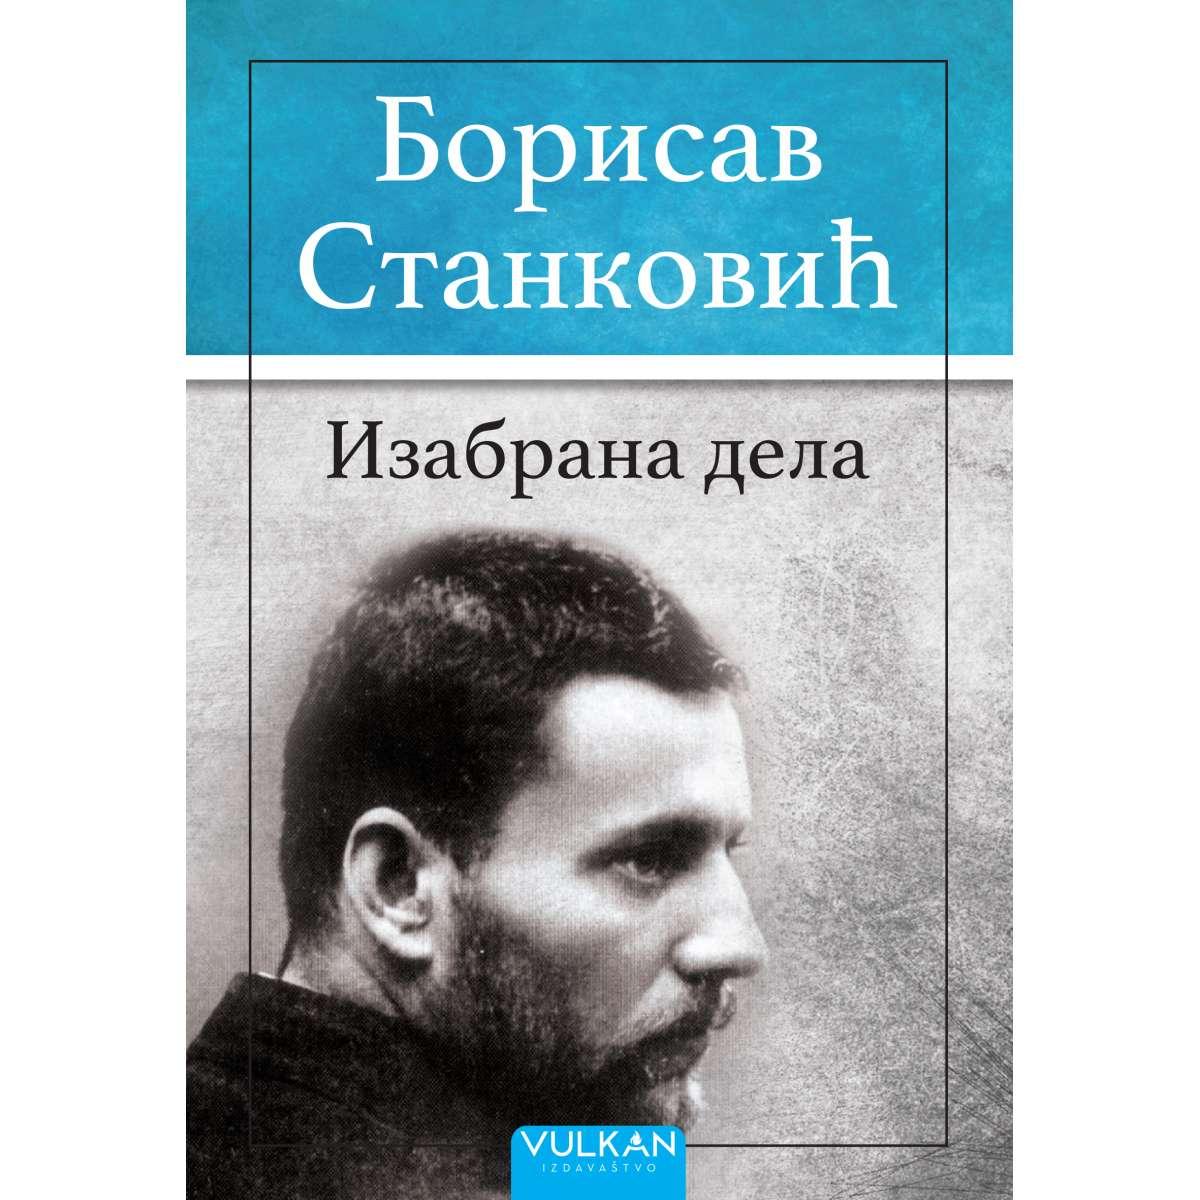 Izabrana dela – Borisav Stanković